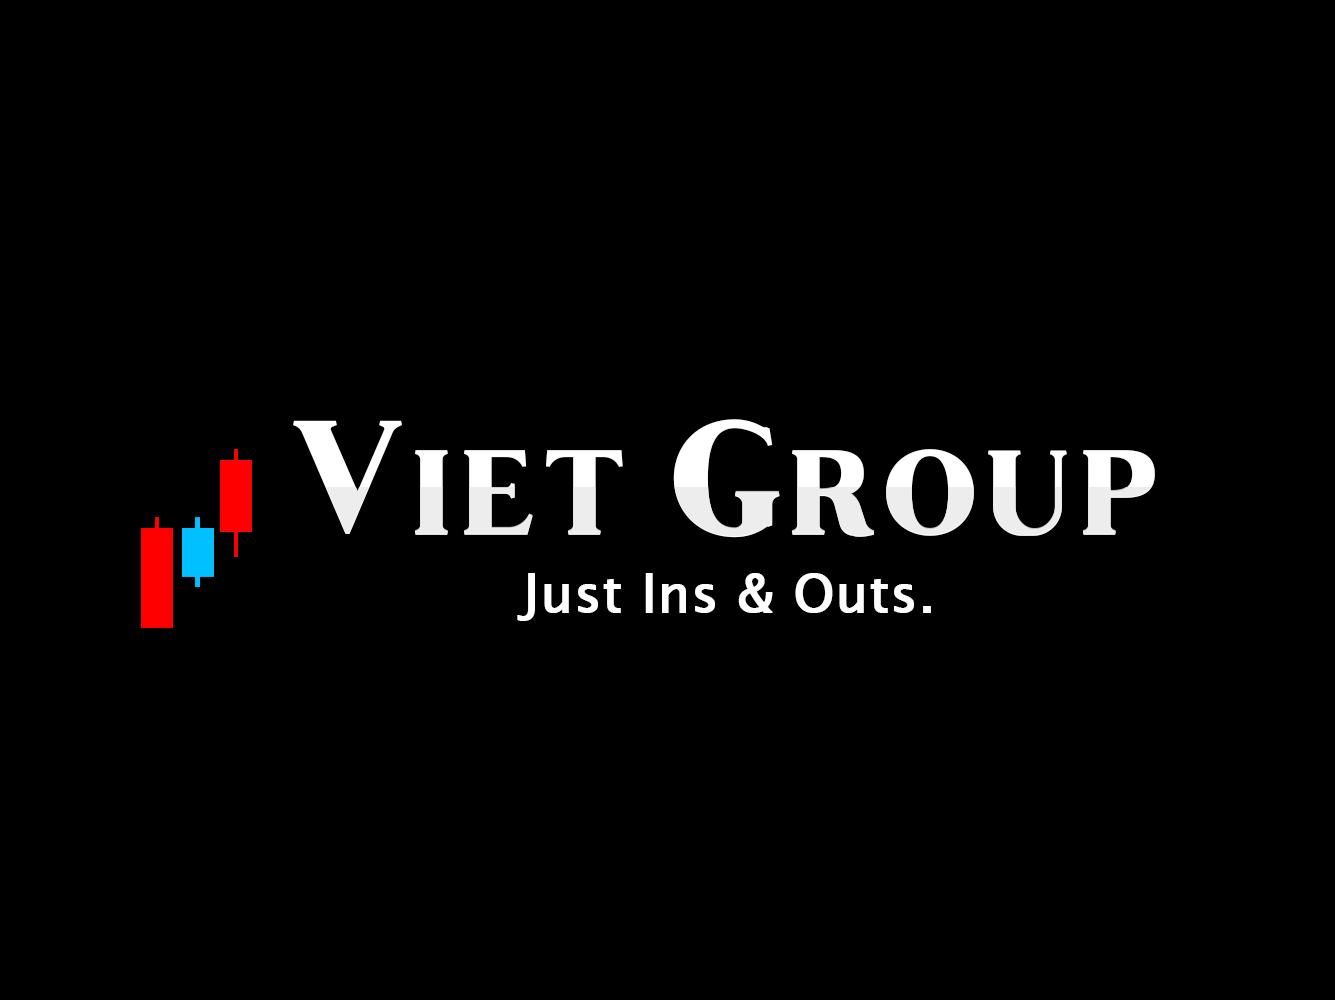 Viet group logo.png